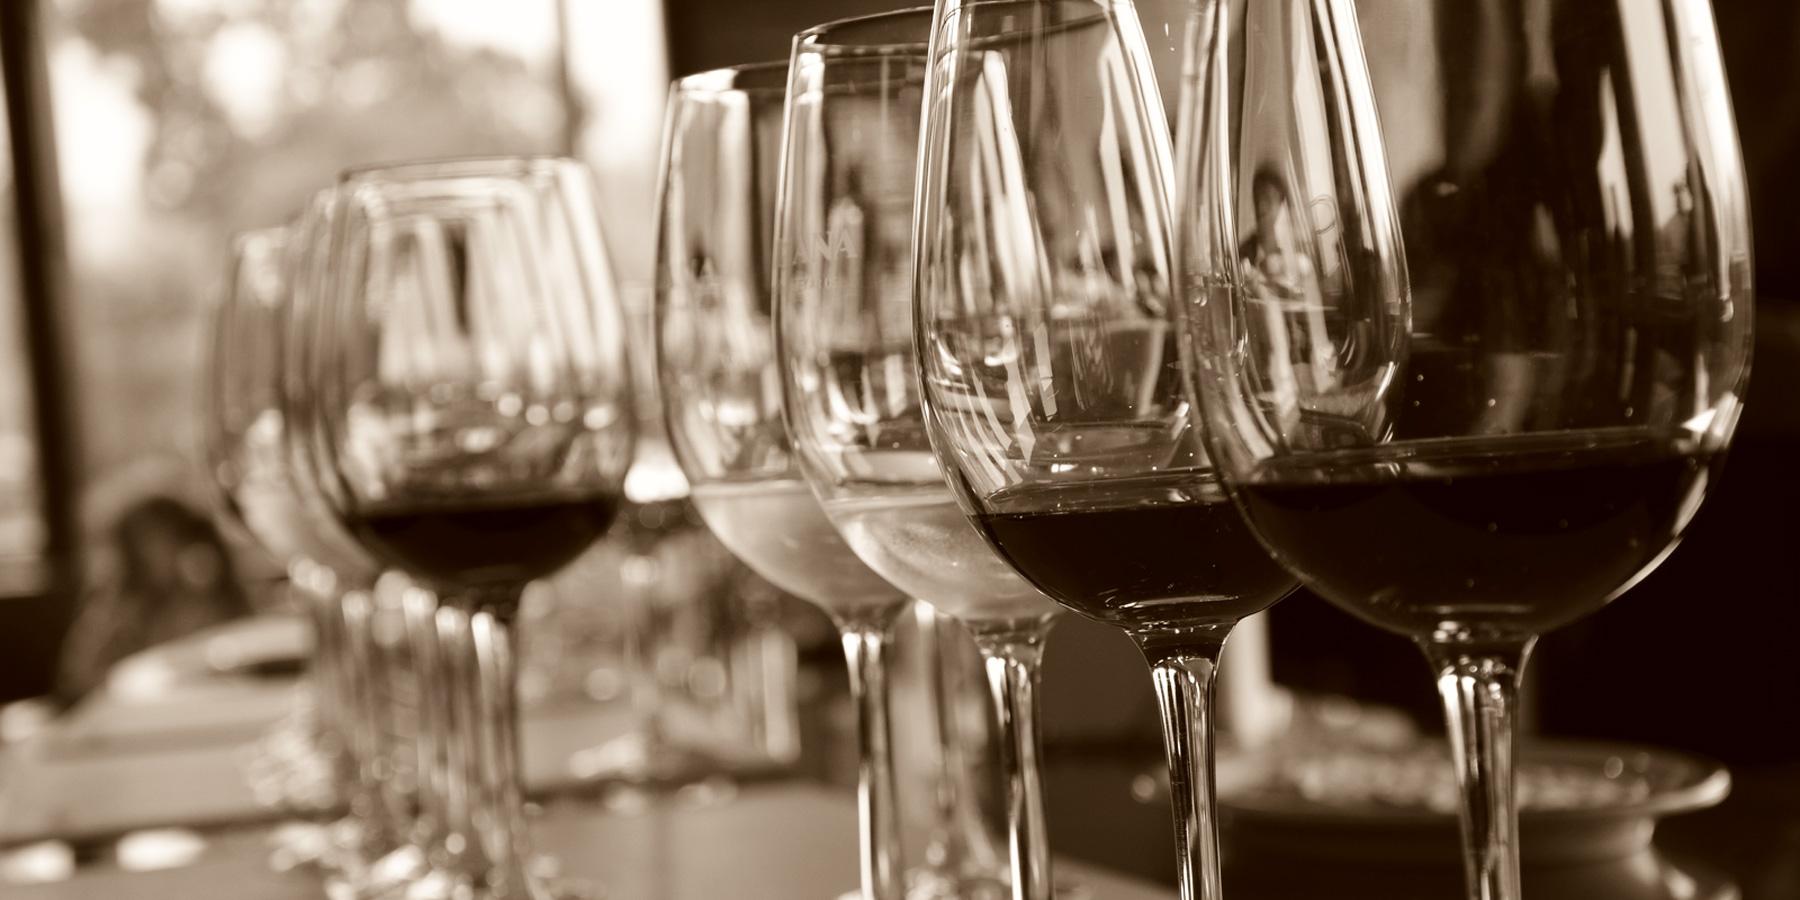 Chili-Vallee-Casablanca-tasting-wine-c-gaelle-montcharmont-3-1600x1200